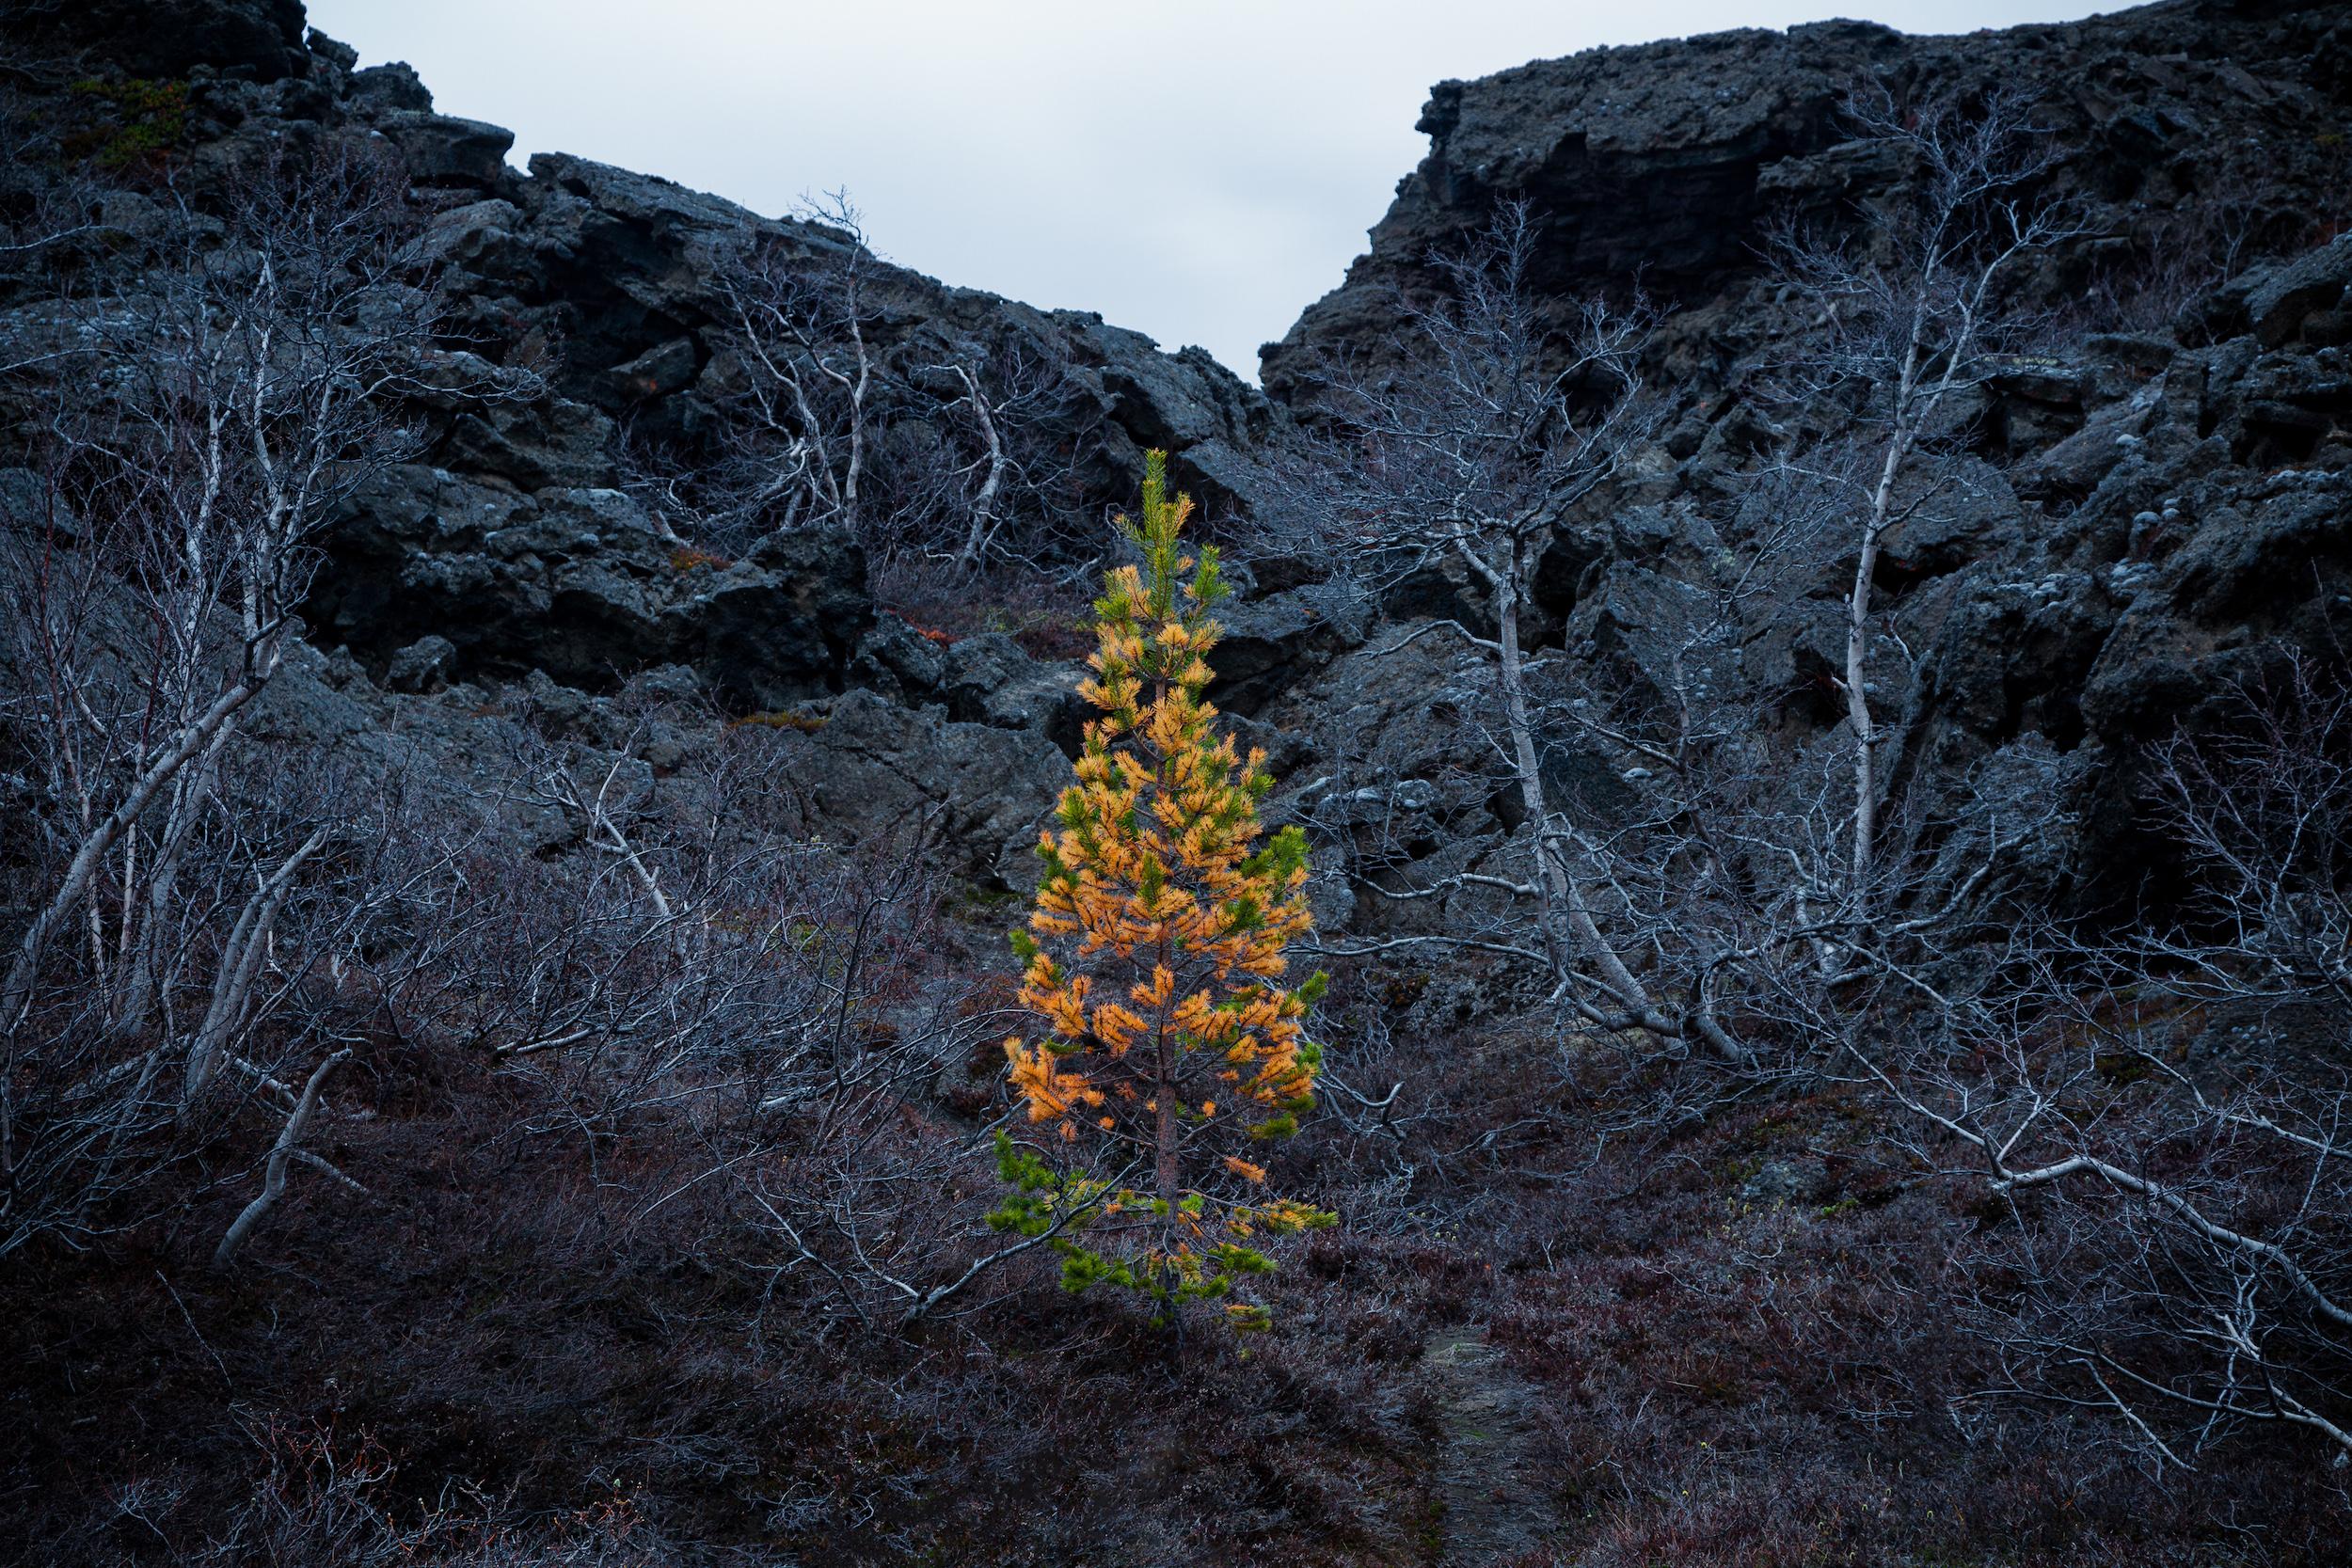 A lone tree in lifeless volcanic scenery